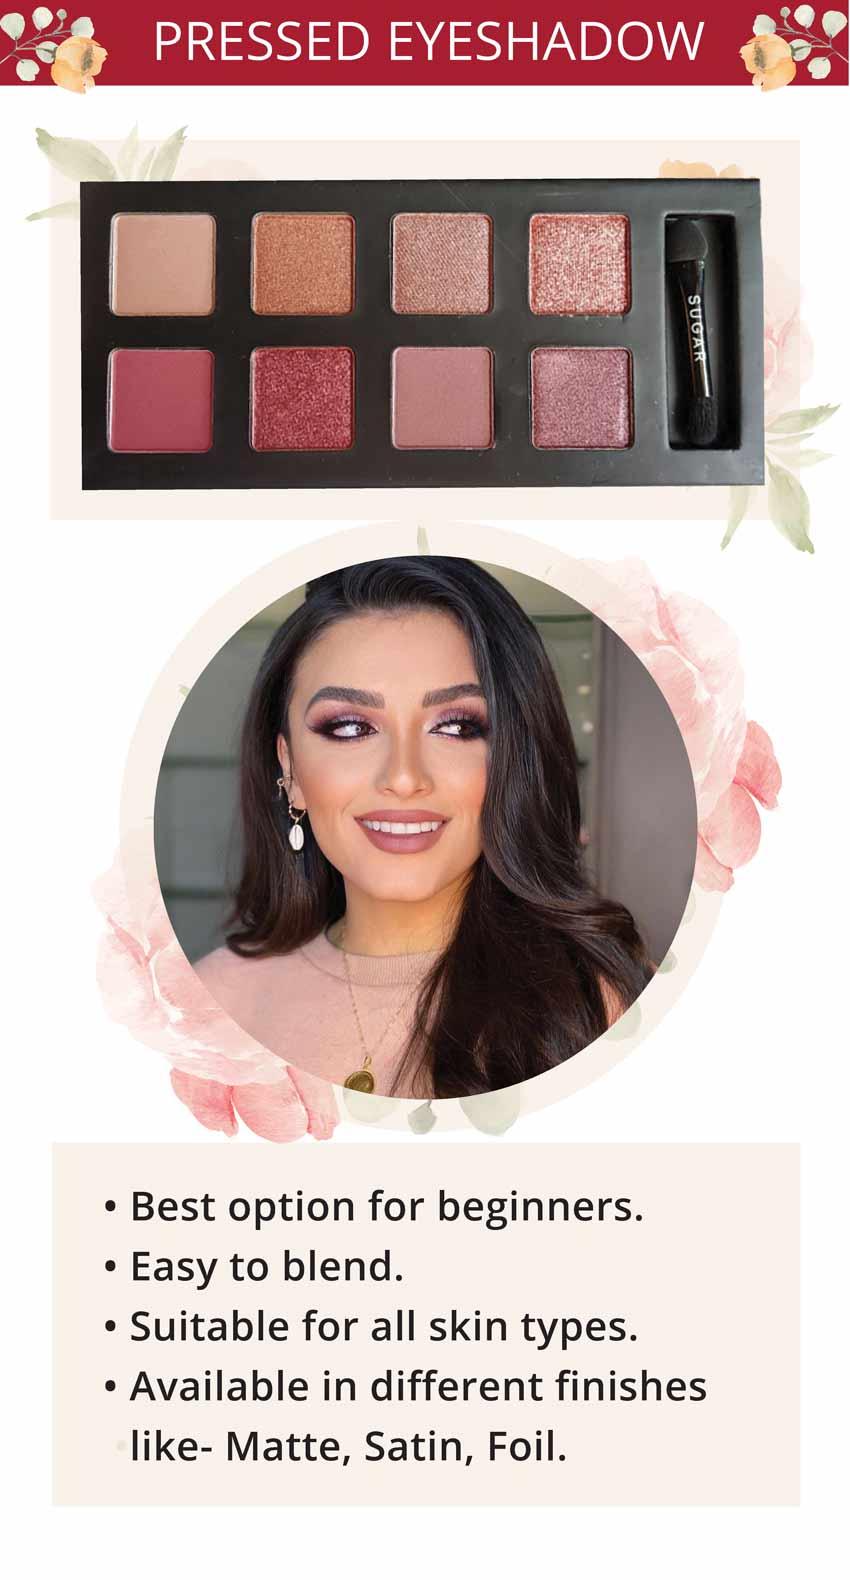 sugar cosmetics pressed eyeshadow makeup look inspiration